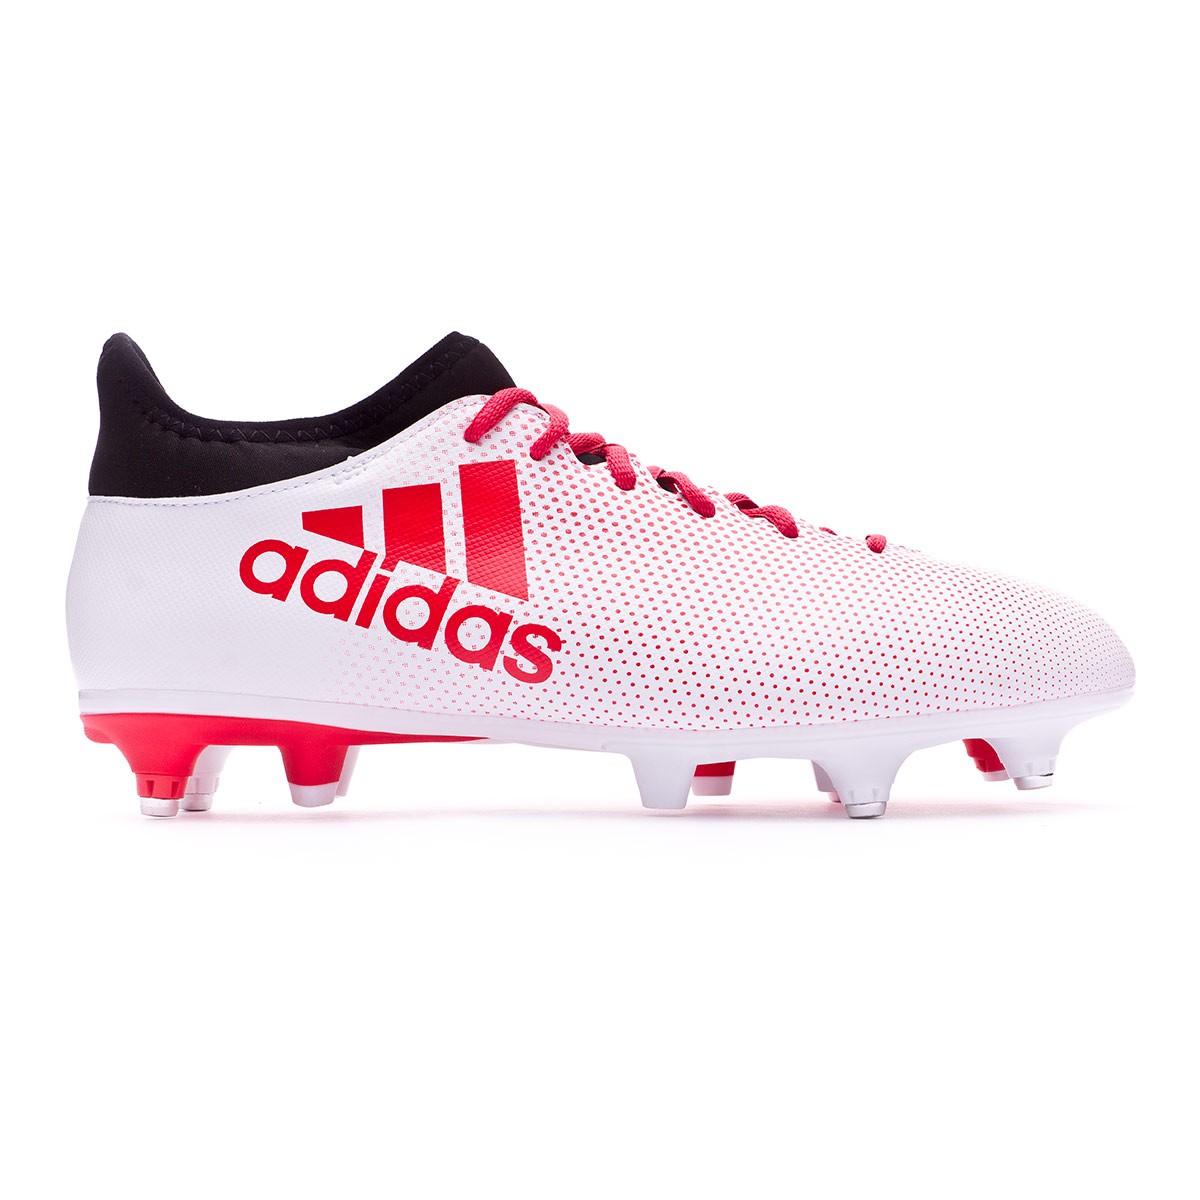 d50adc44e1b Chaussure de foot adidas X 17.3 SG Grey-Real coral-Core black - Boutique de football  Fútbol Emotion